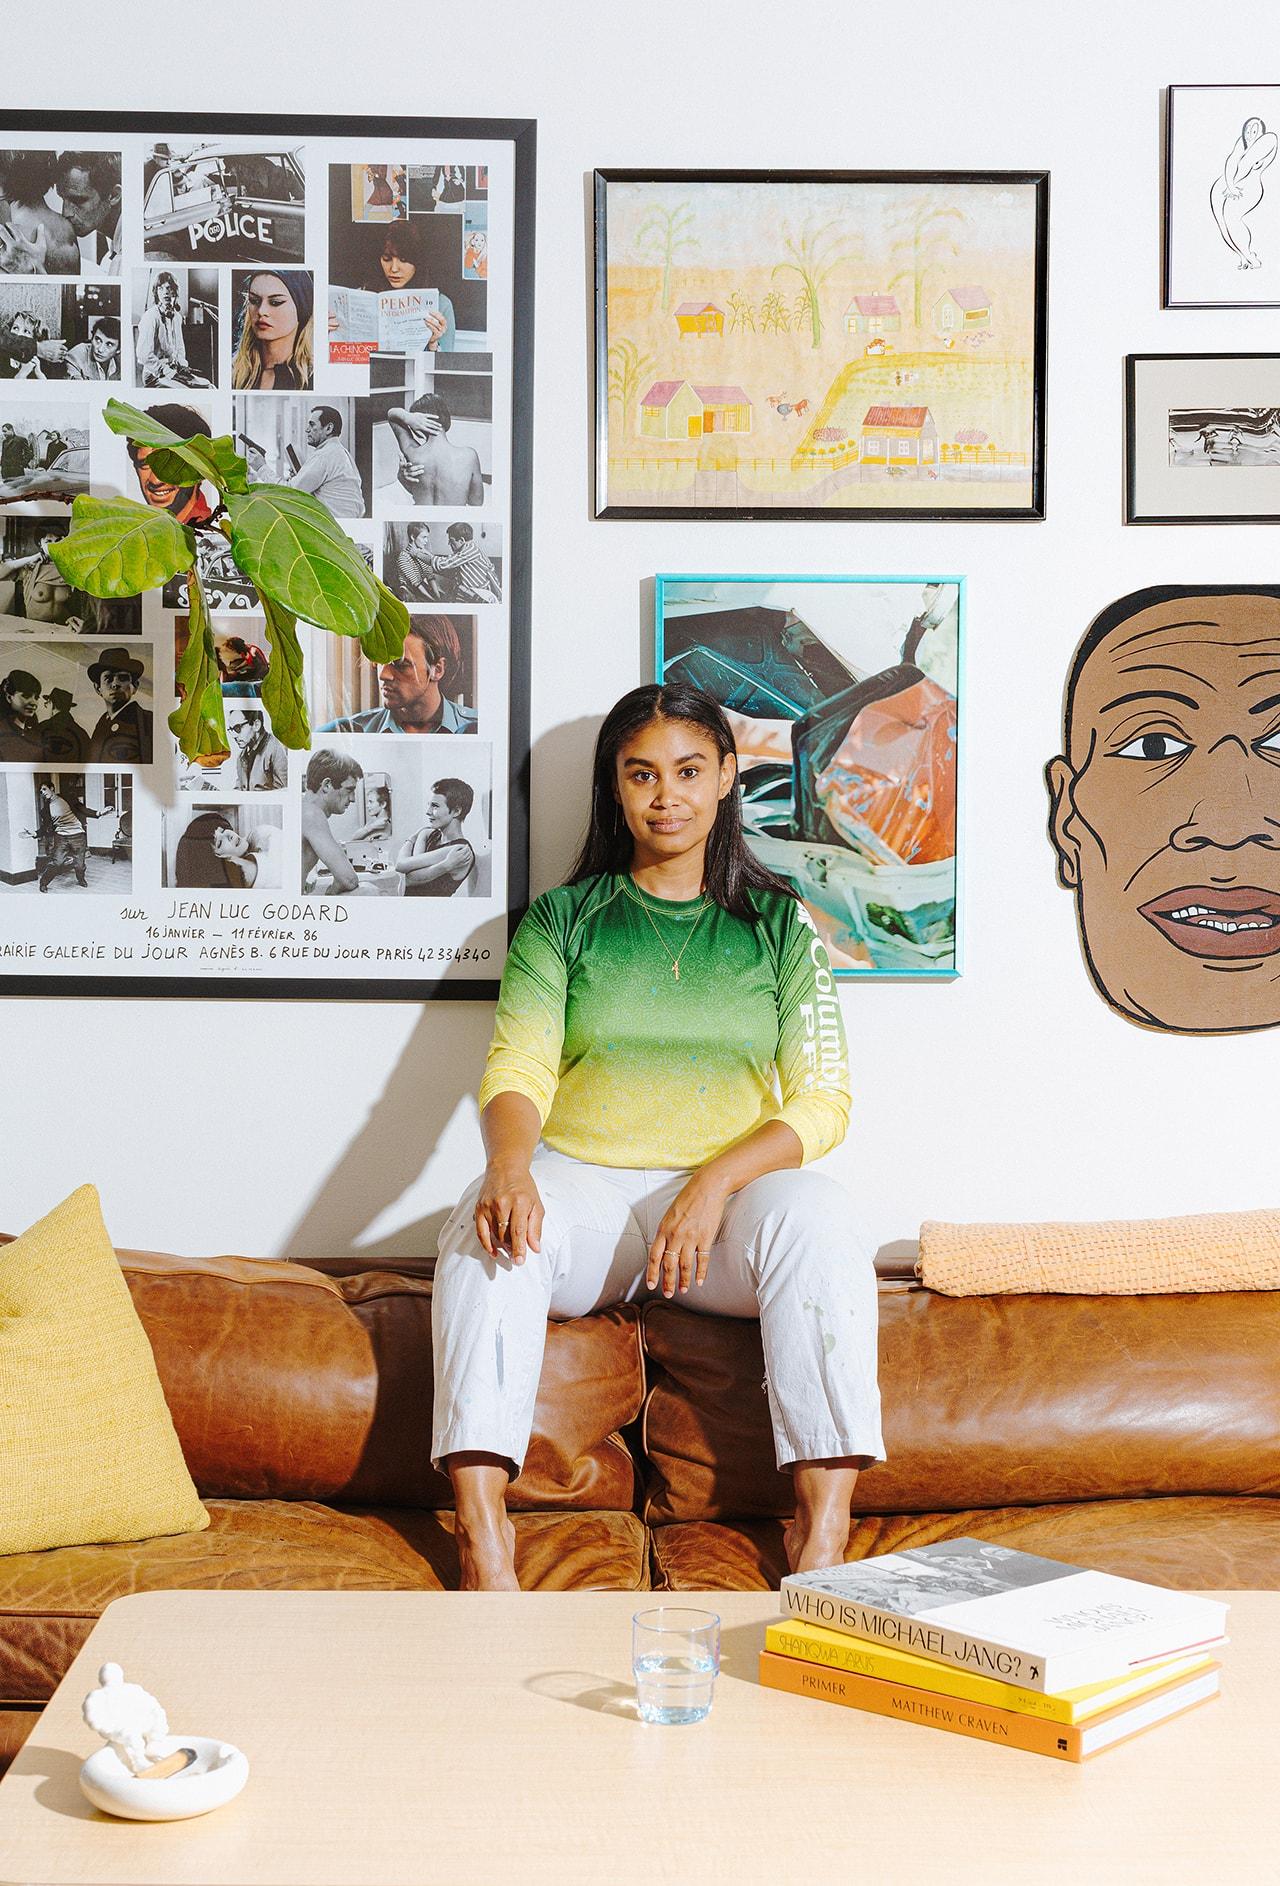 YOWIE Founder Shannon Maldonado Home Philadelphia Living Room Poster Art Books House Plants Planters Shelf